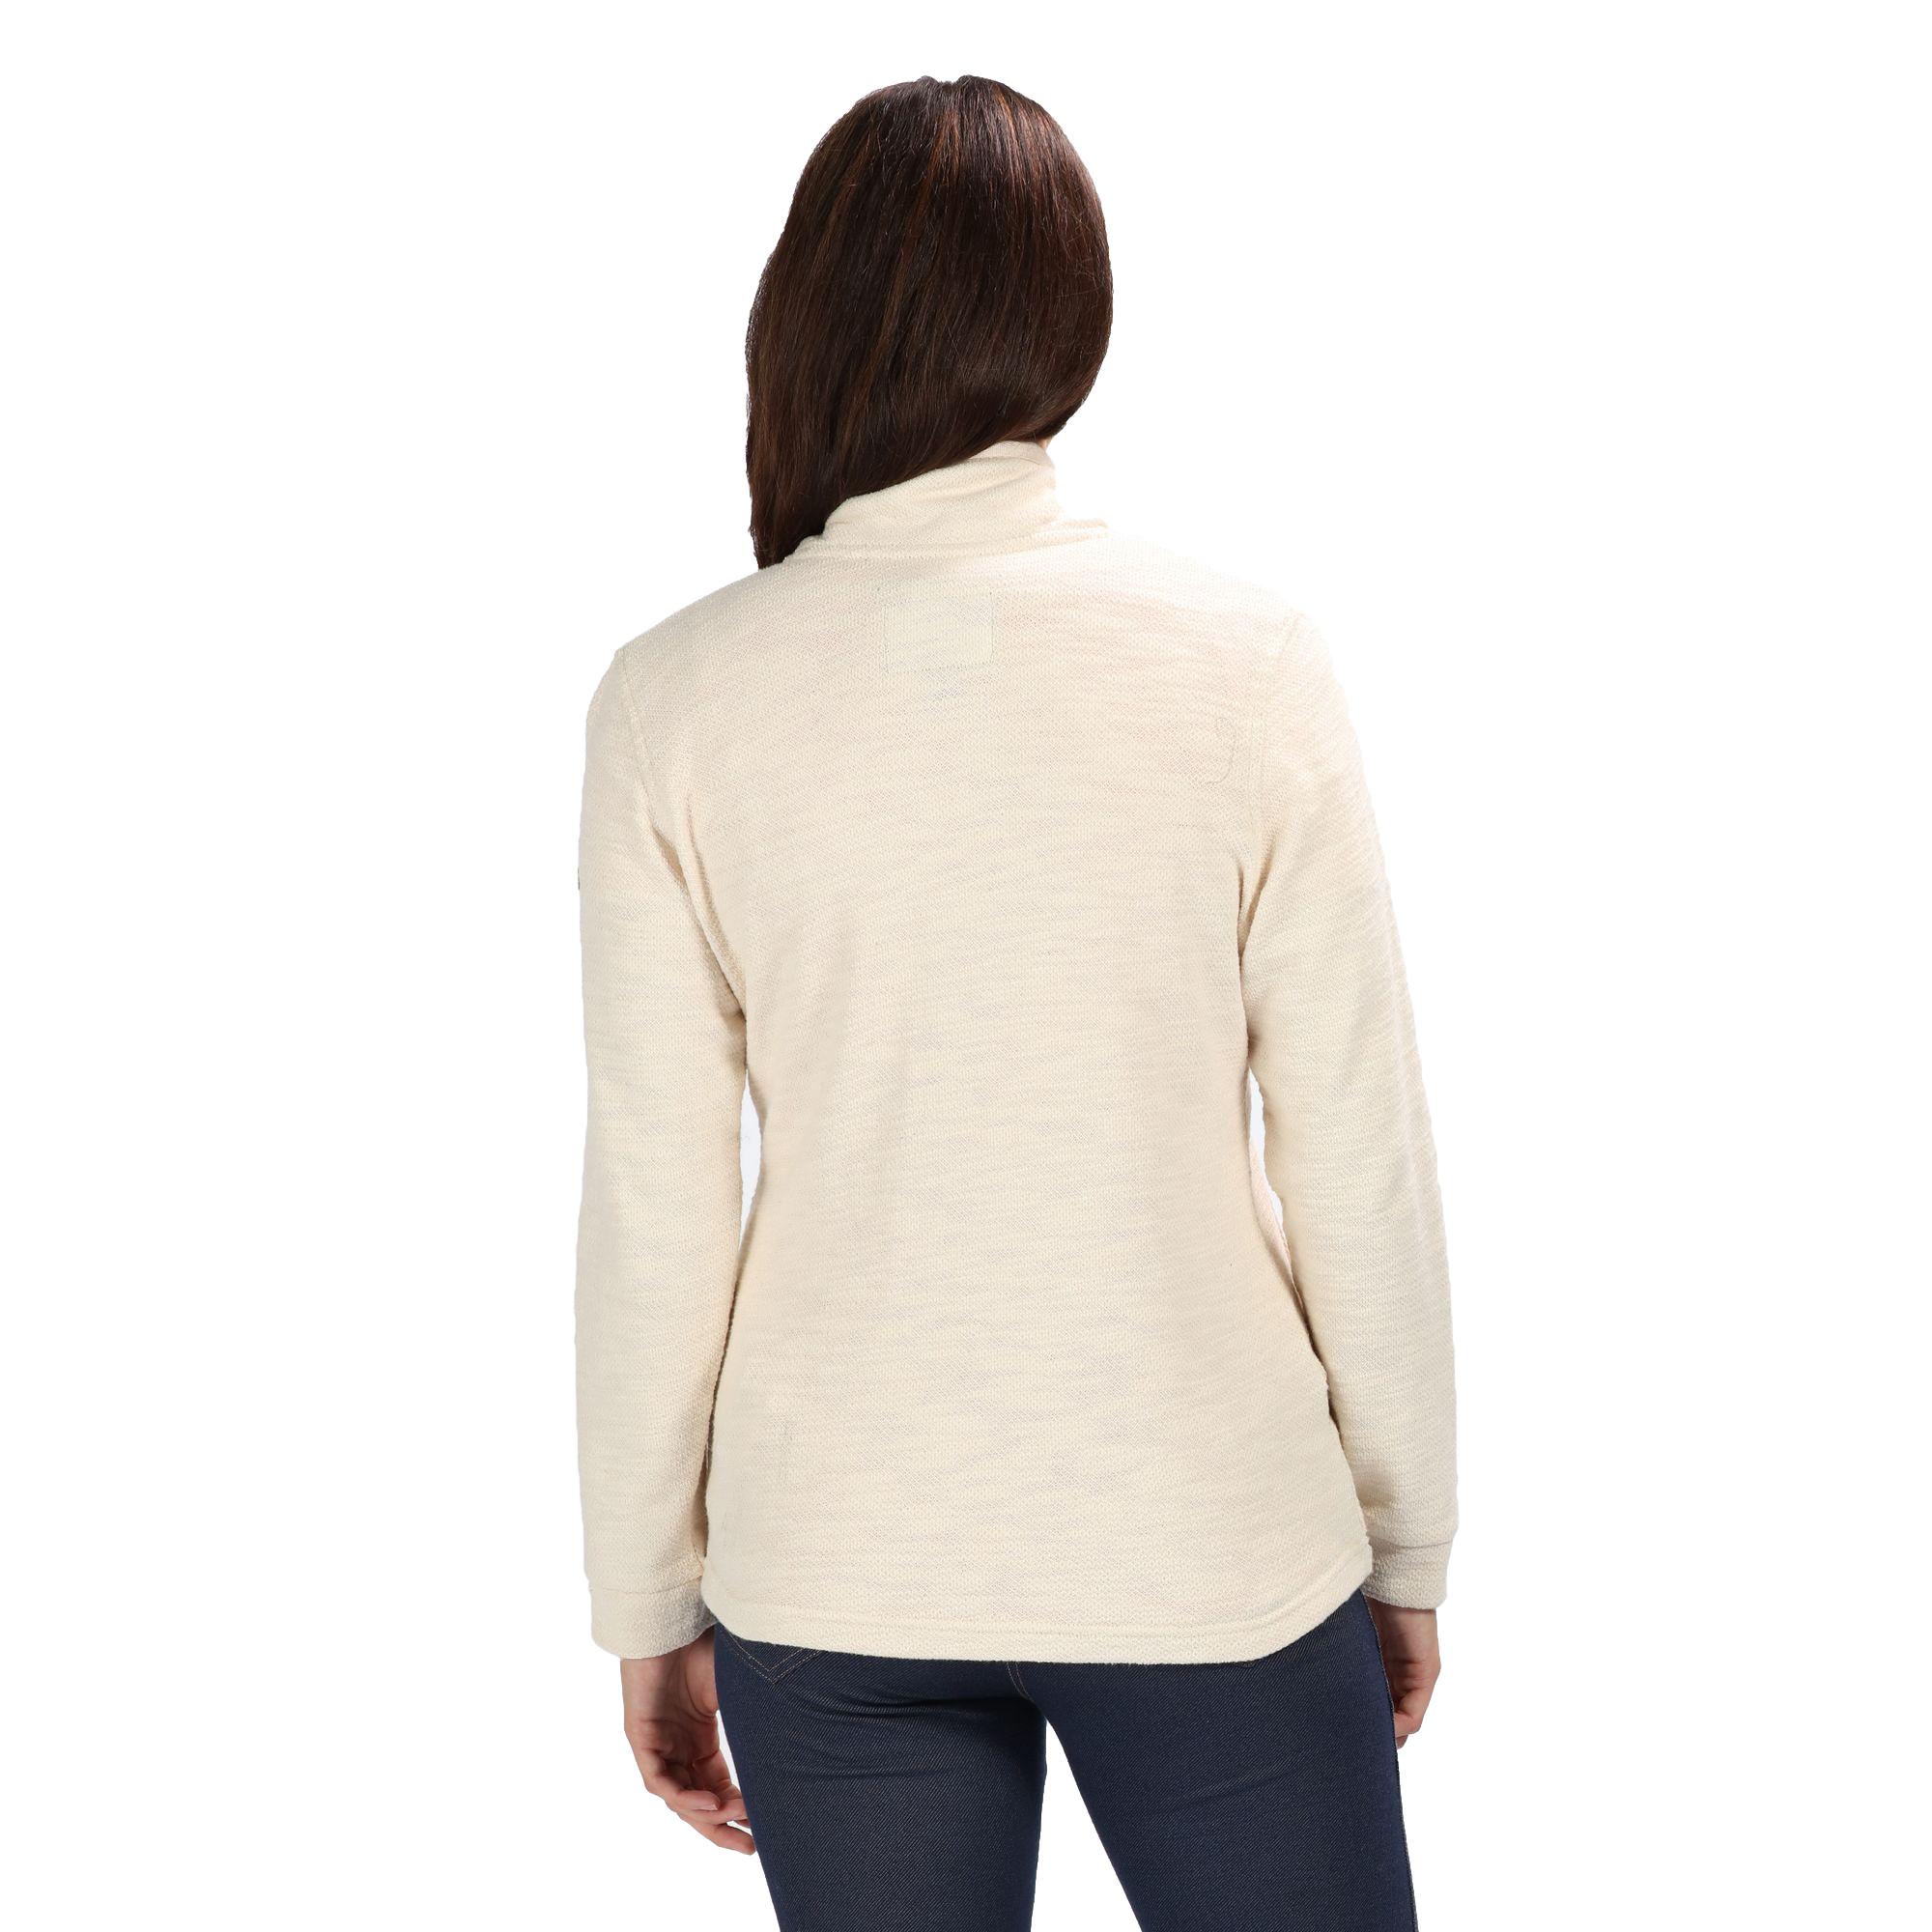 Regatta-Odetta-Womens-Warm-Curved-Full-Zip-Fleece-Jacket-RRP-50 thumbnail 23